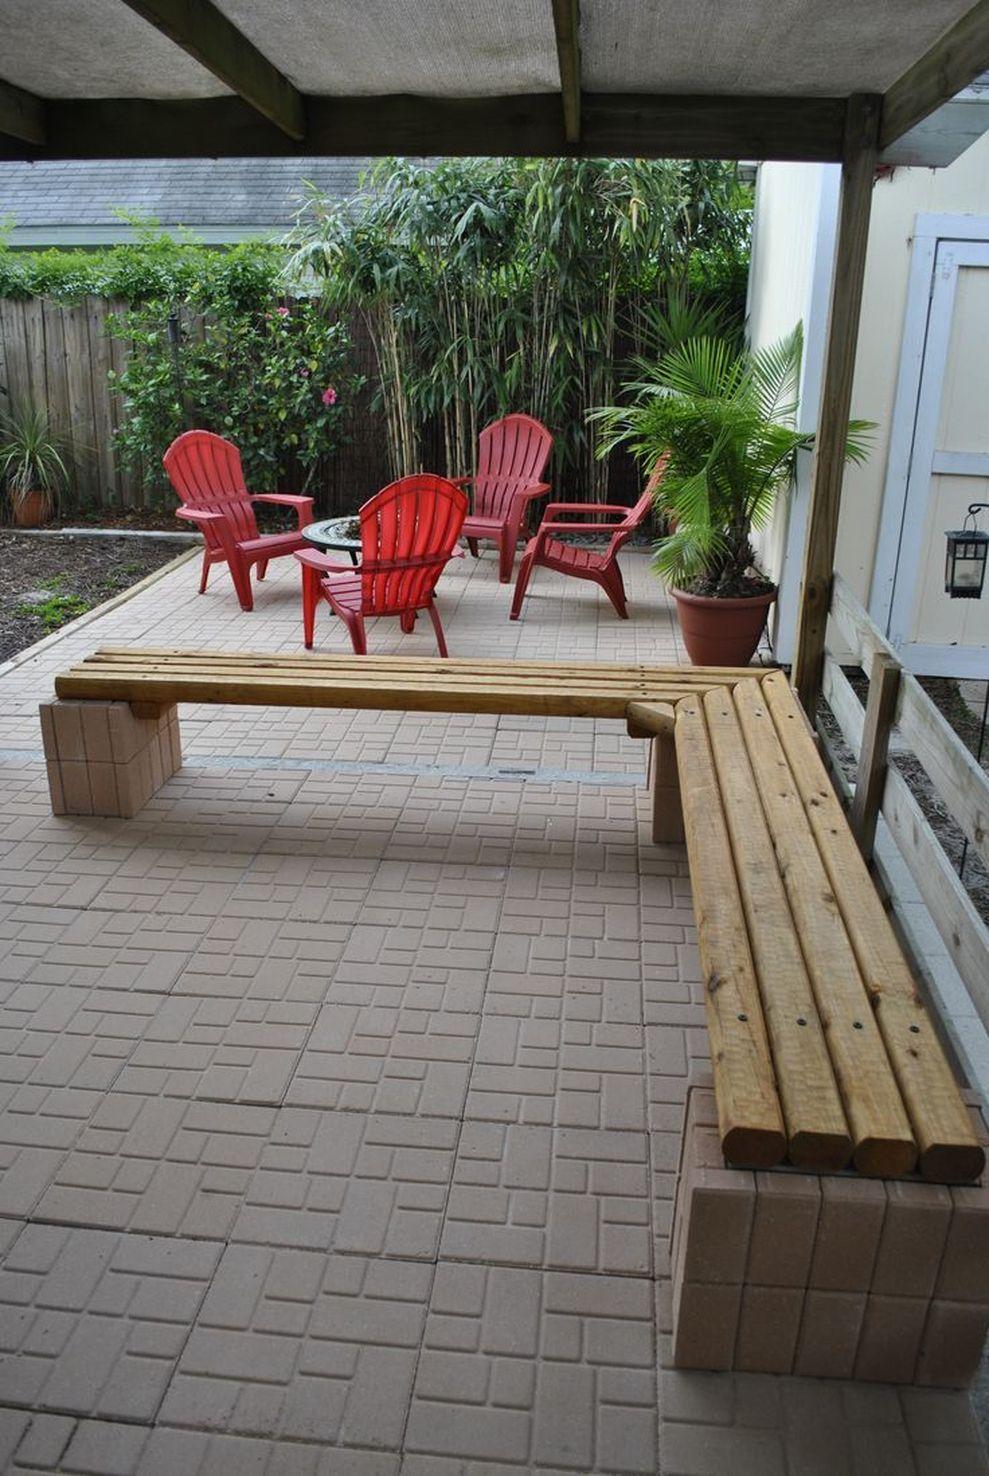 Cinder block furniture backyard 47